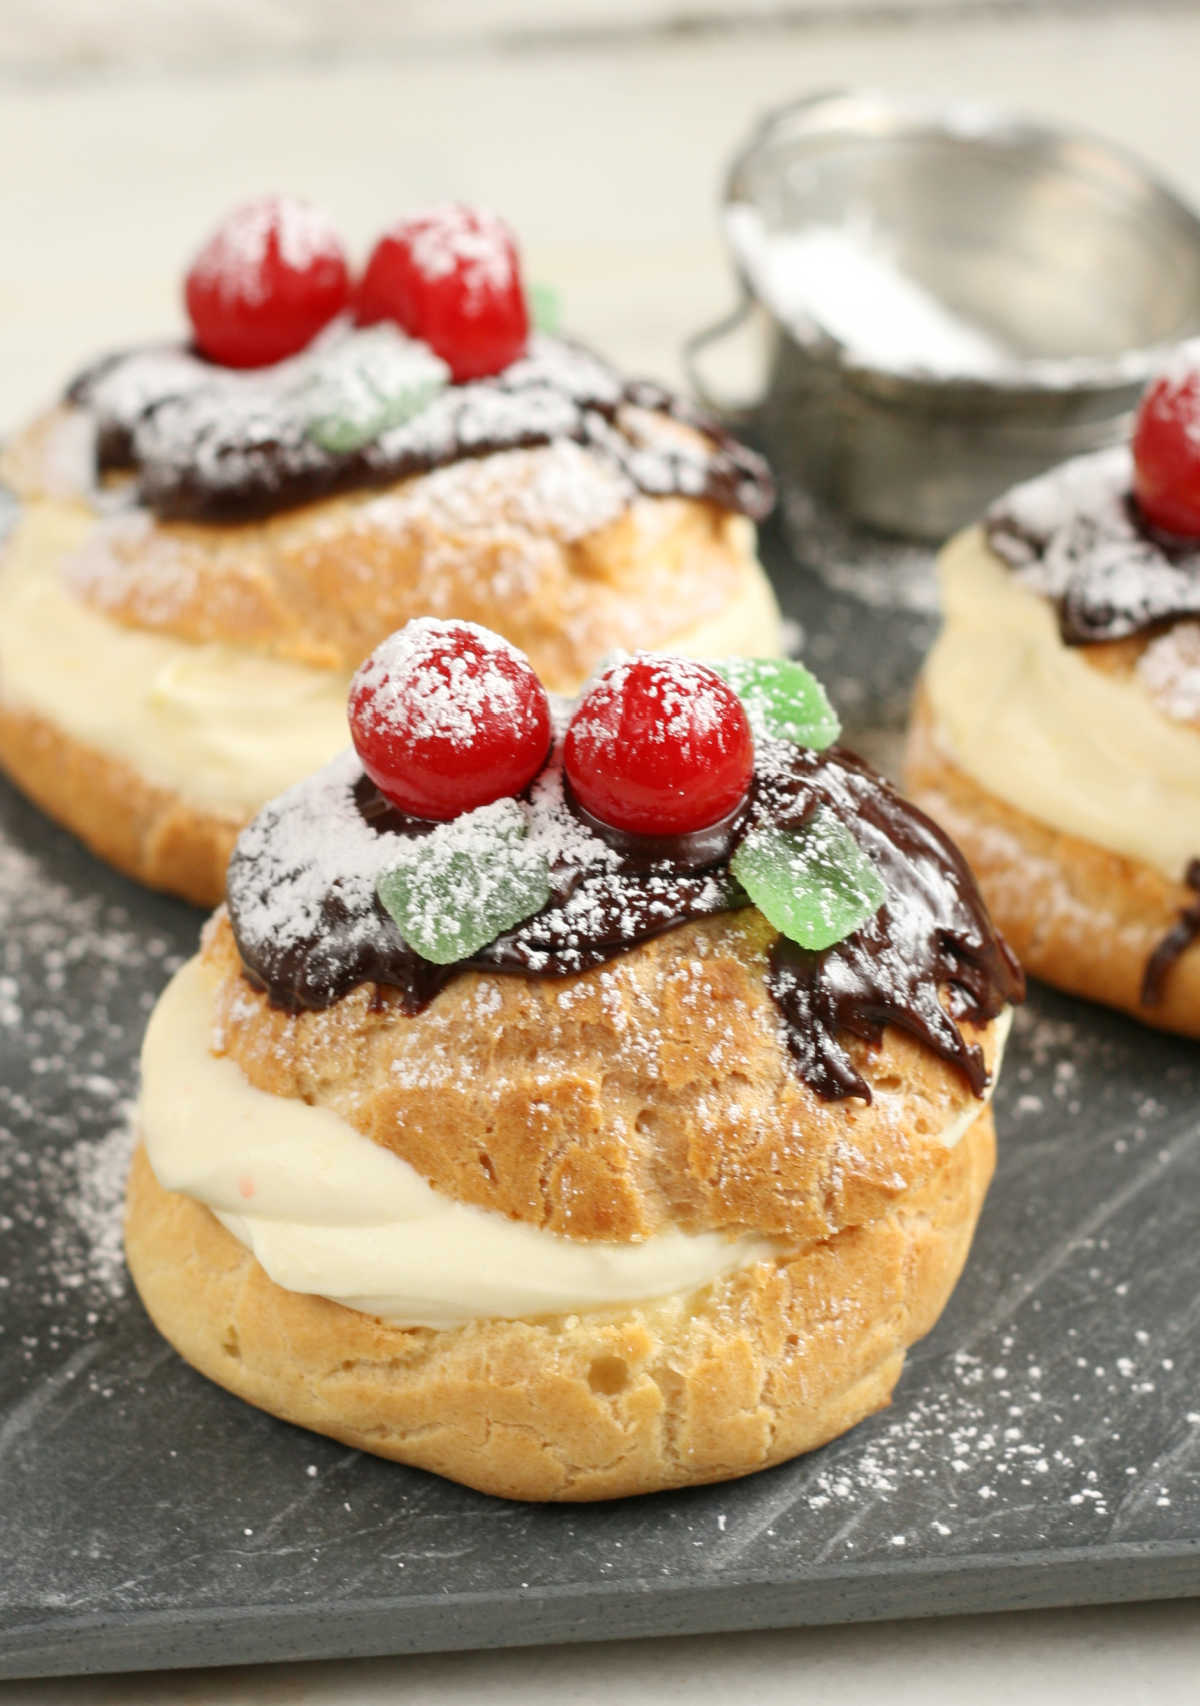 Cream puffs with pastry cream, chocolate ganache, maraschino cherries, green leaf candies dusted with powdered sugar.